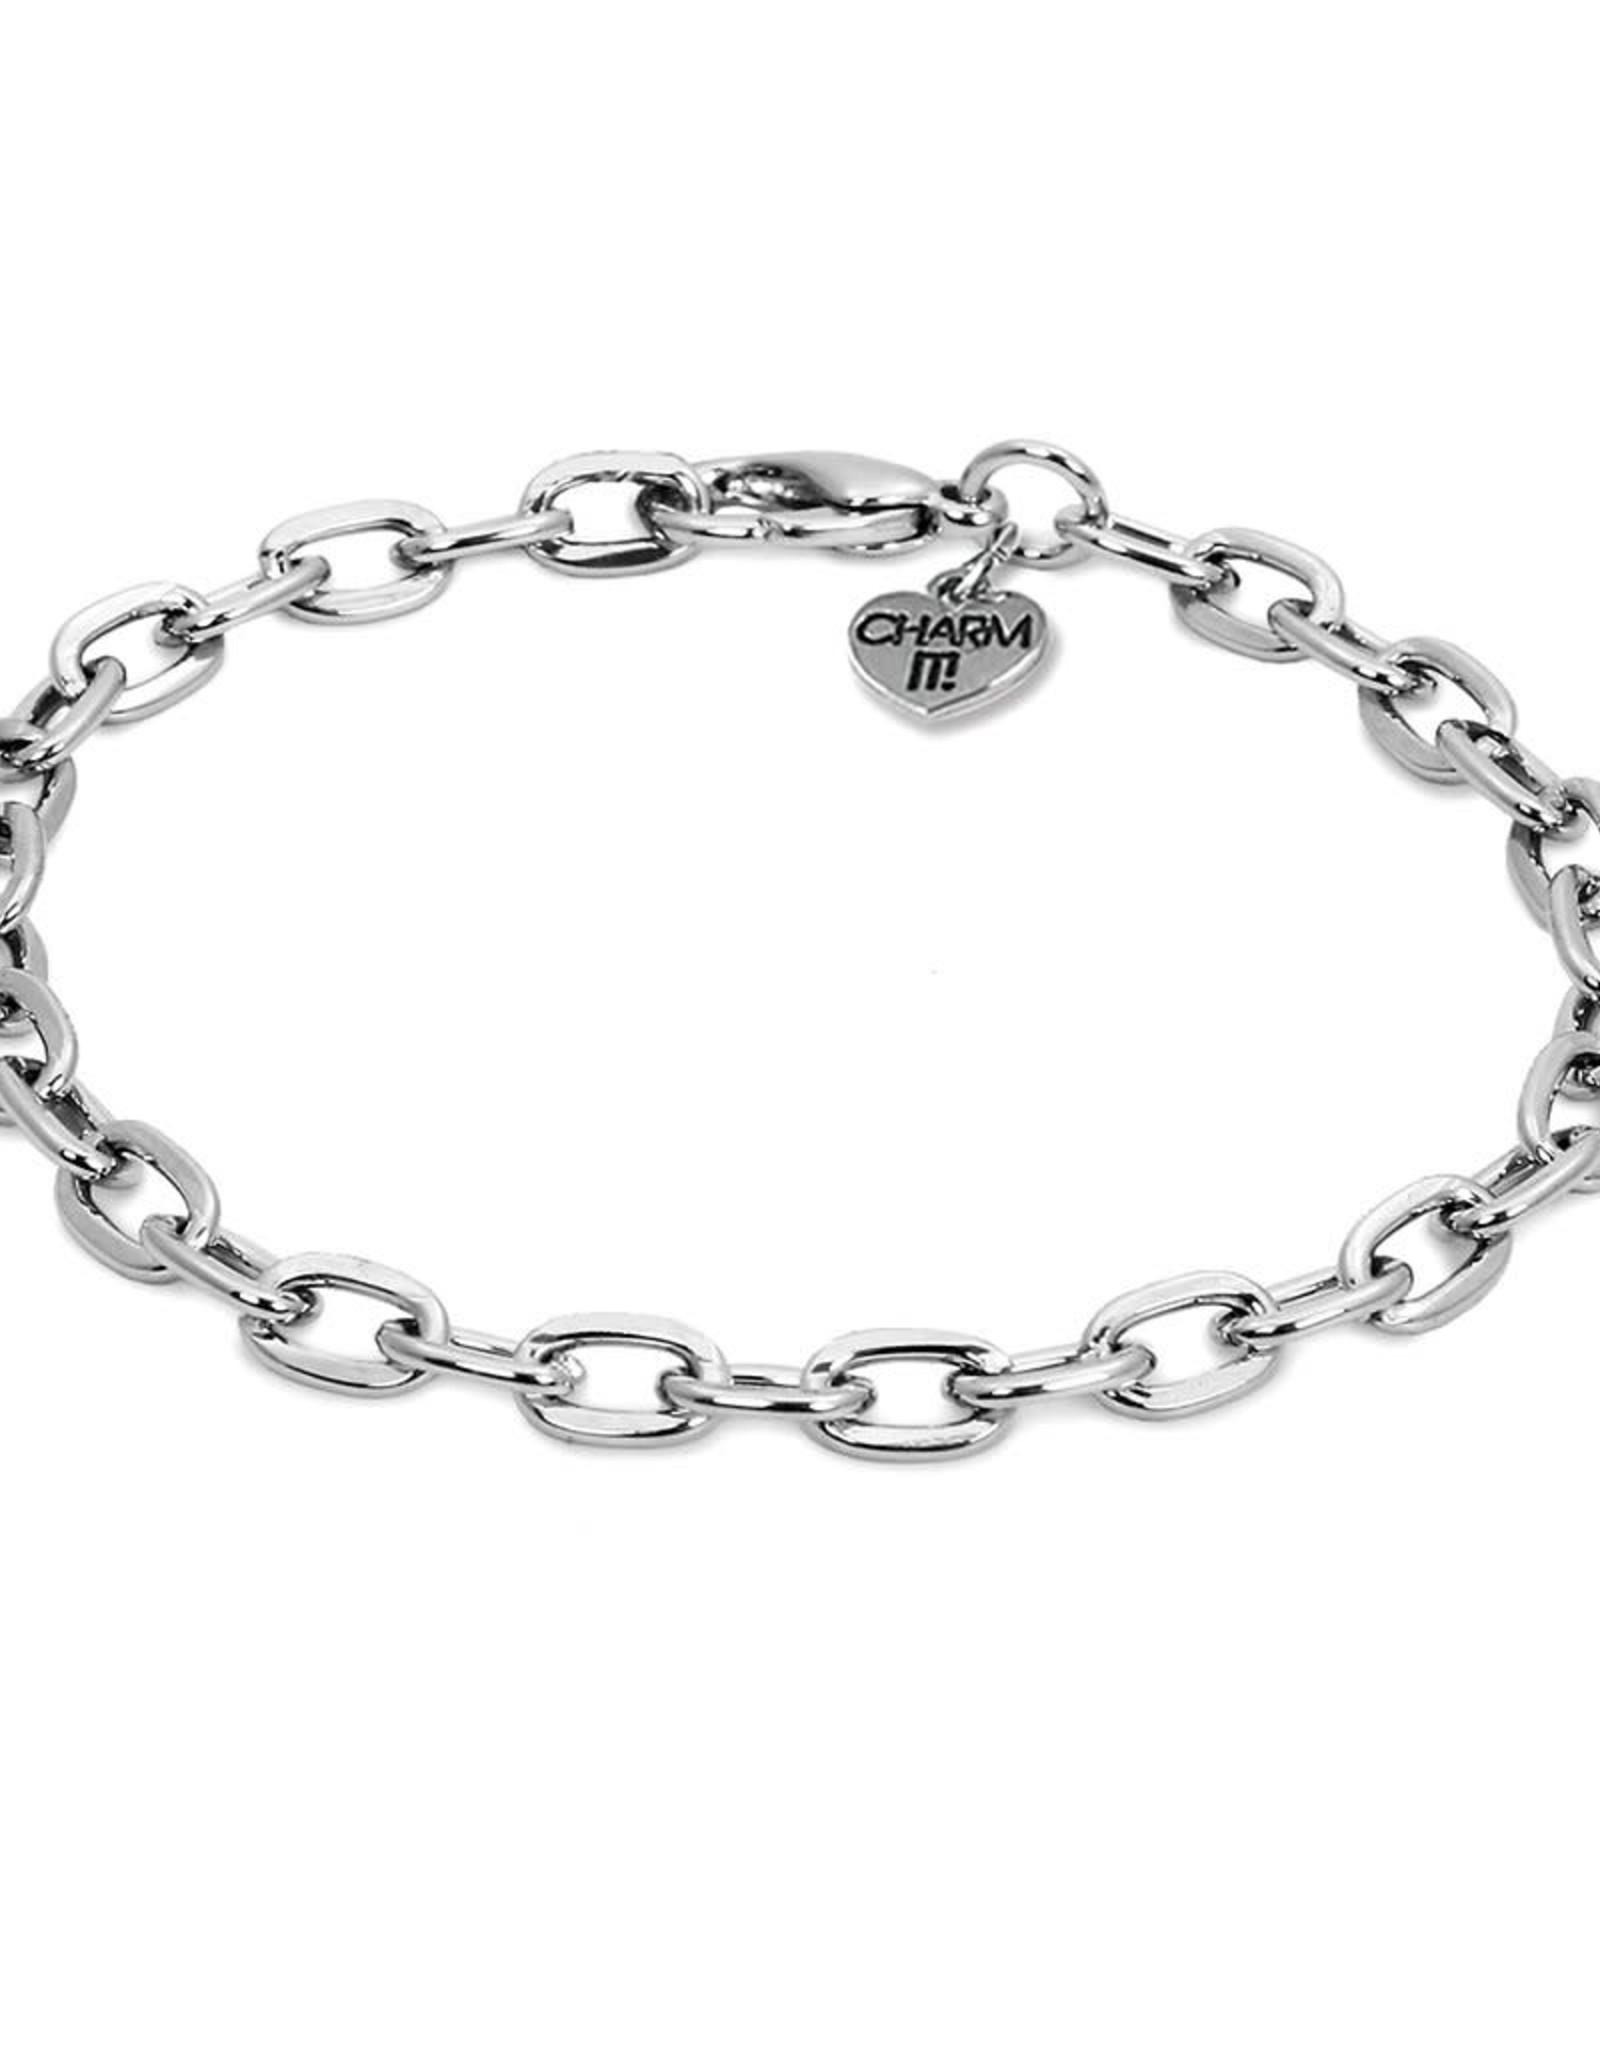 Charm It Charm Bracelet Silver Chain